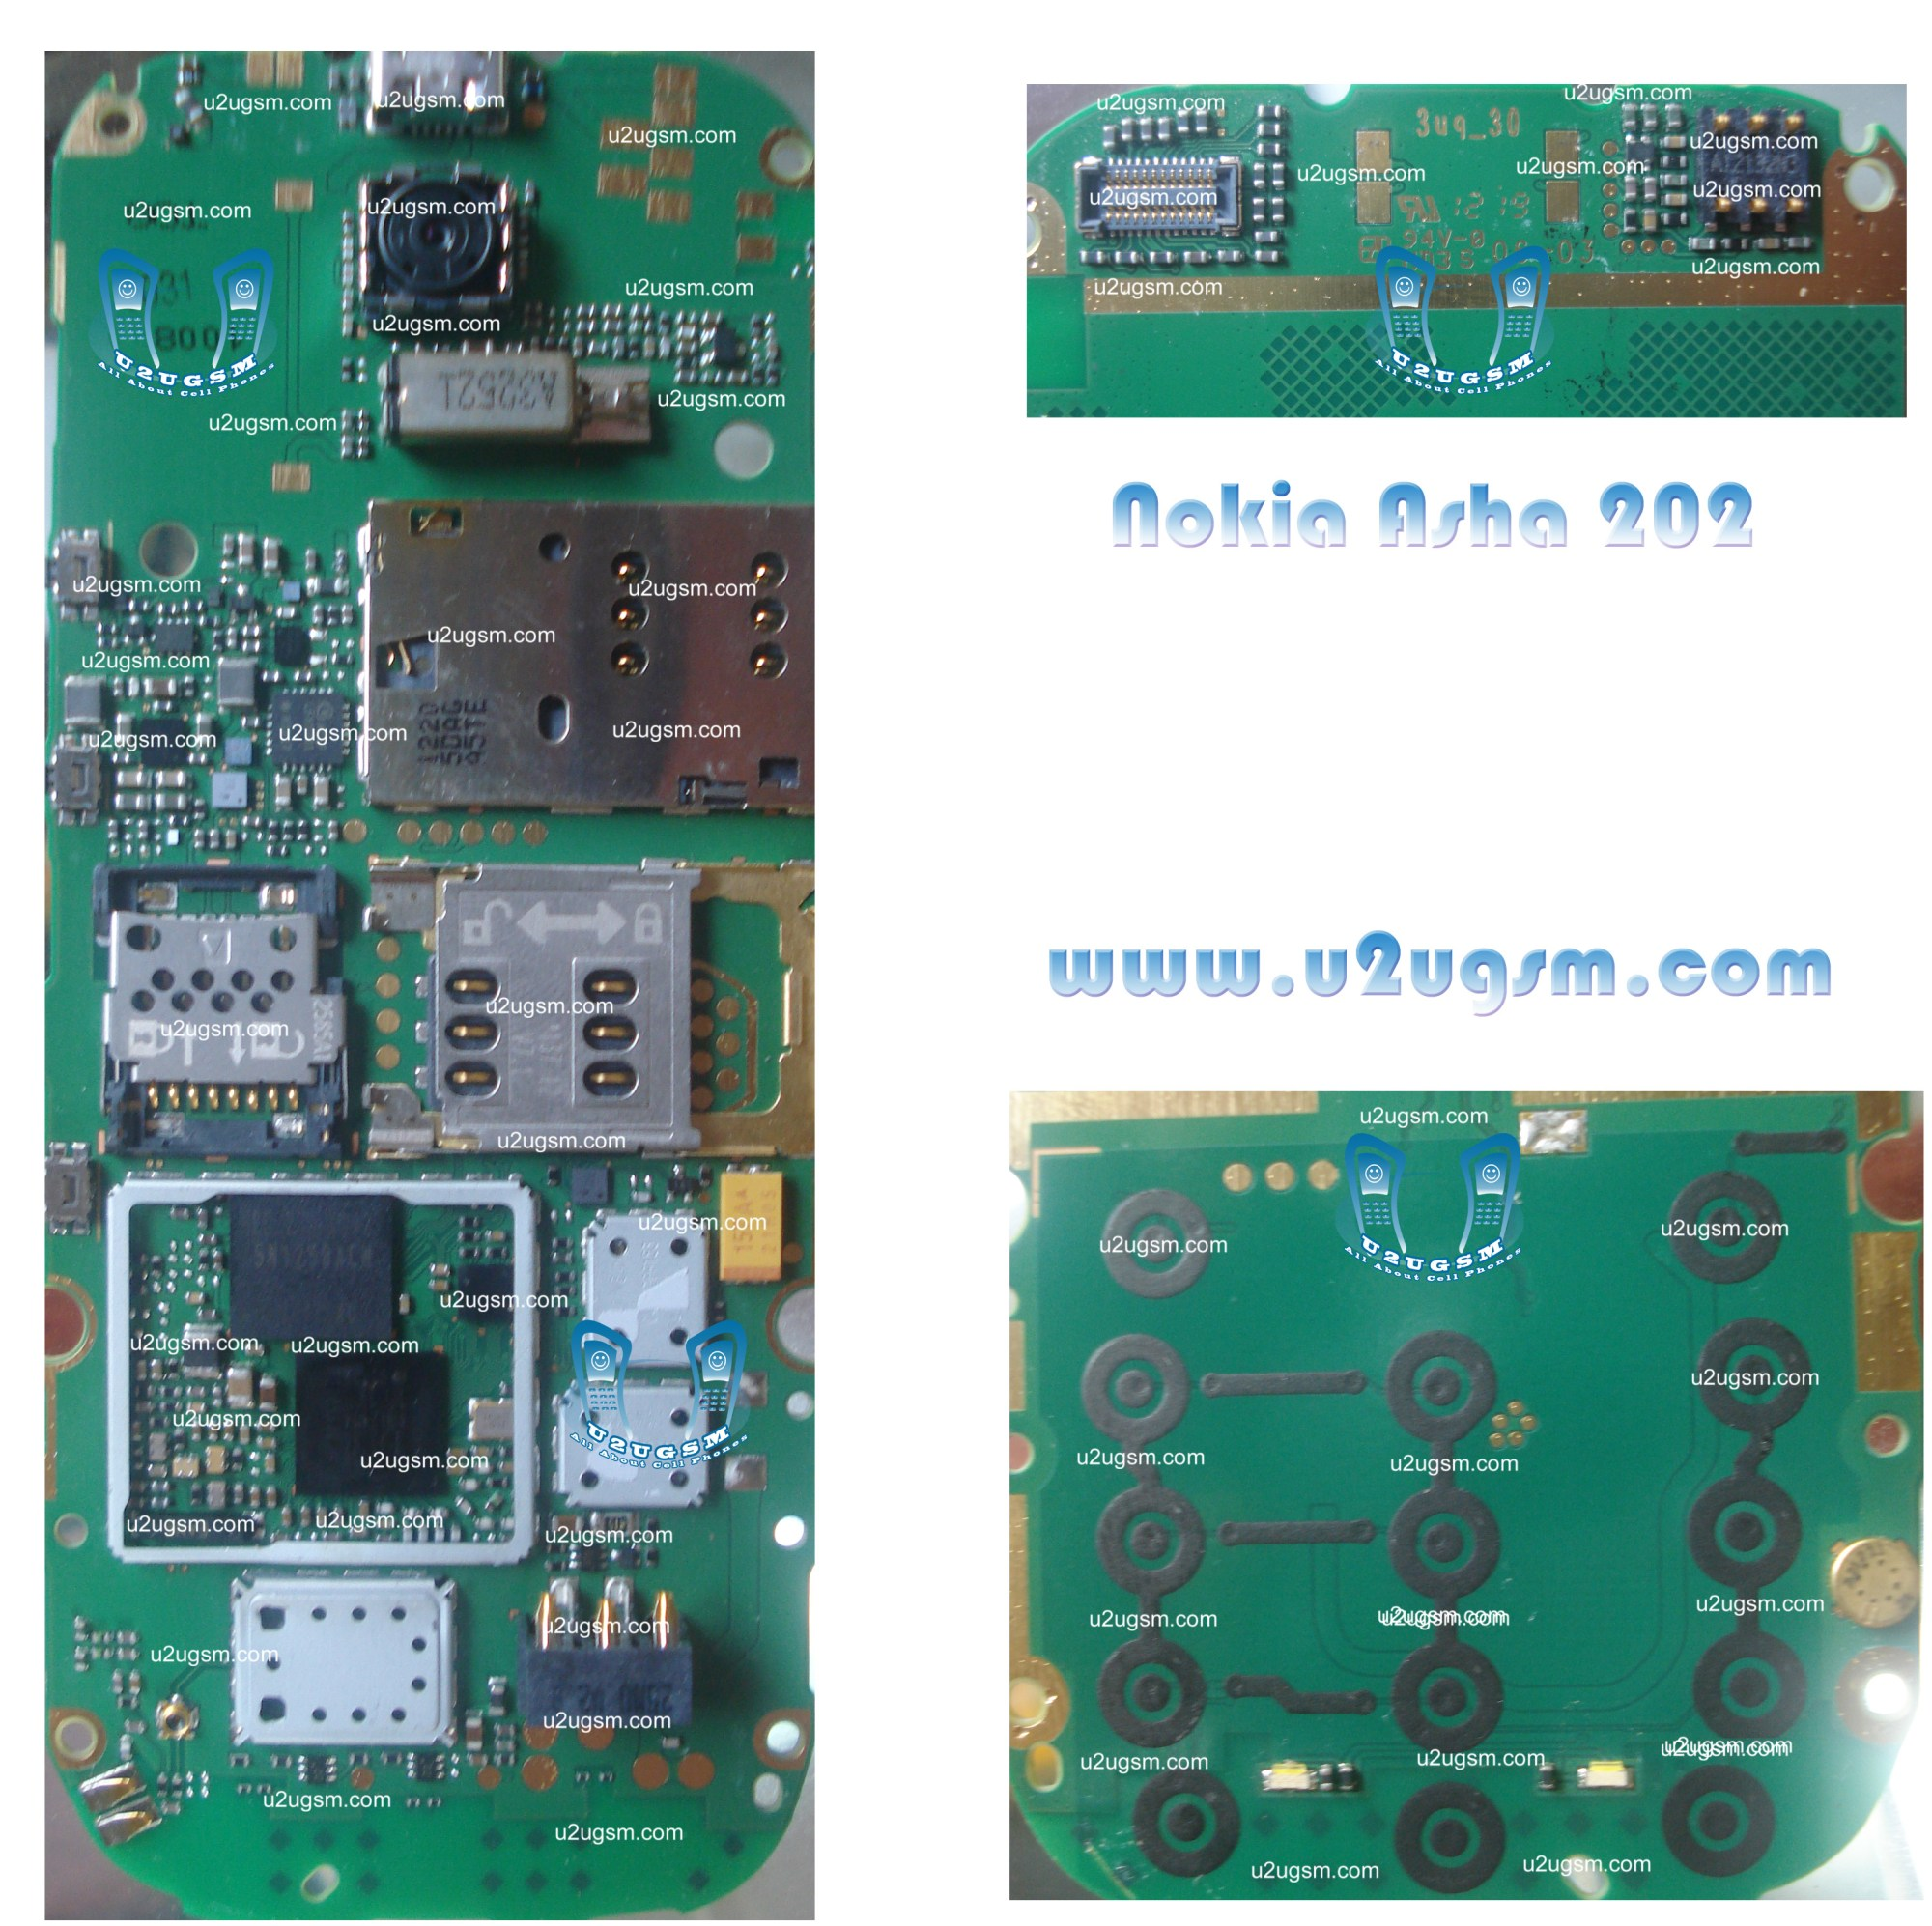 hight resolution of nokia 114 pcb circuit diagram wiring diagram weeknokia asha 202 full pcb diagram mother board layout